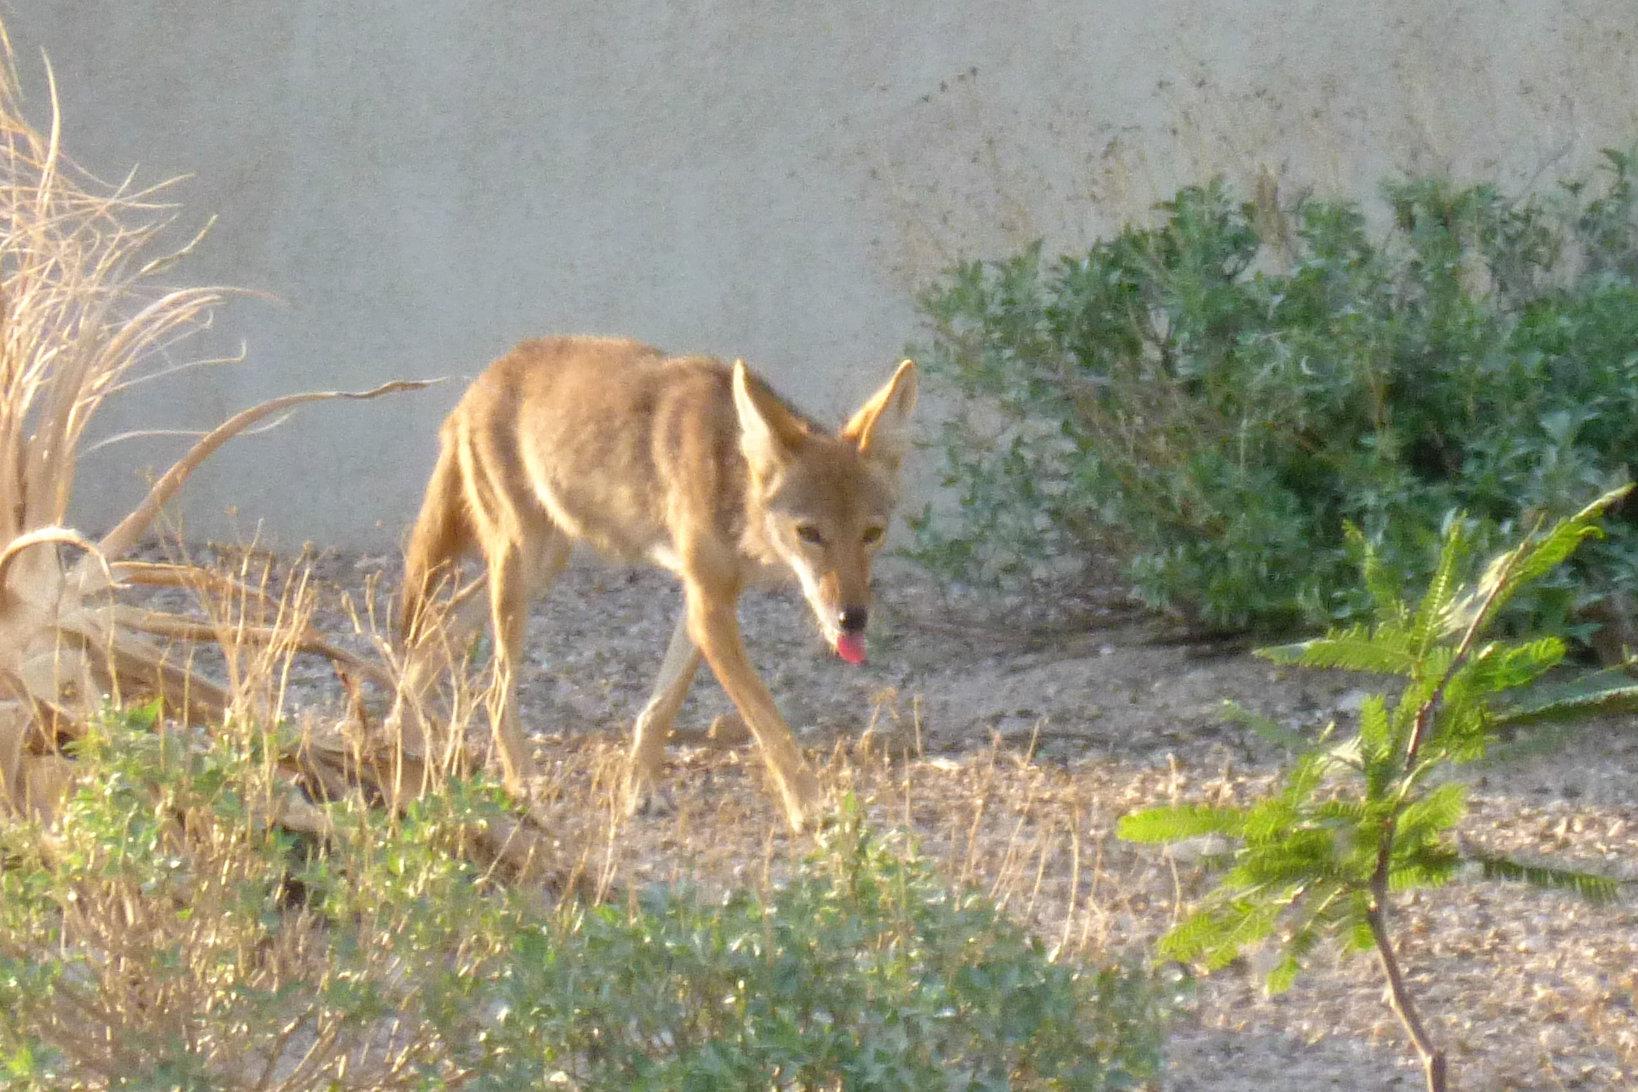 Desert coyote pictures - photo#9